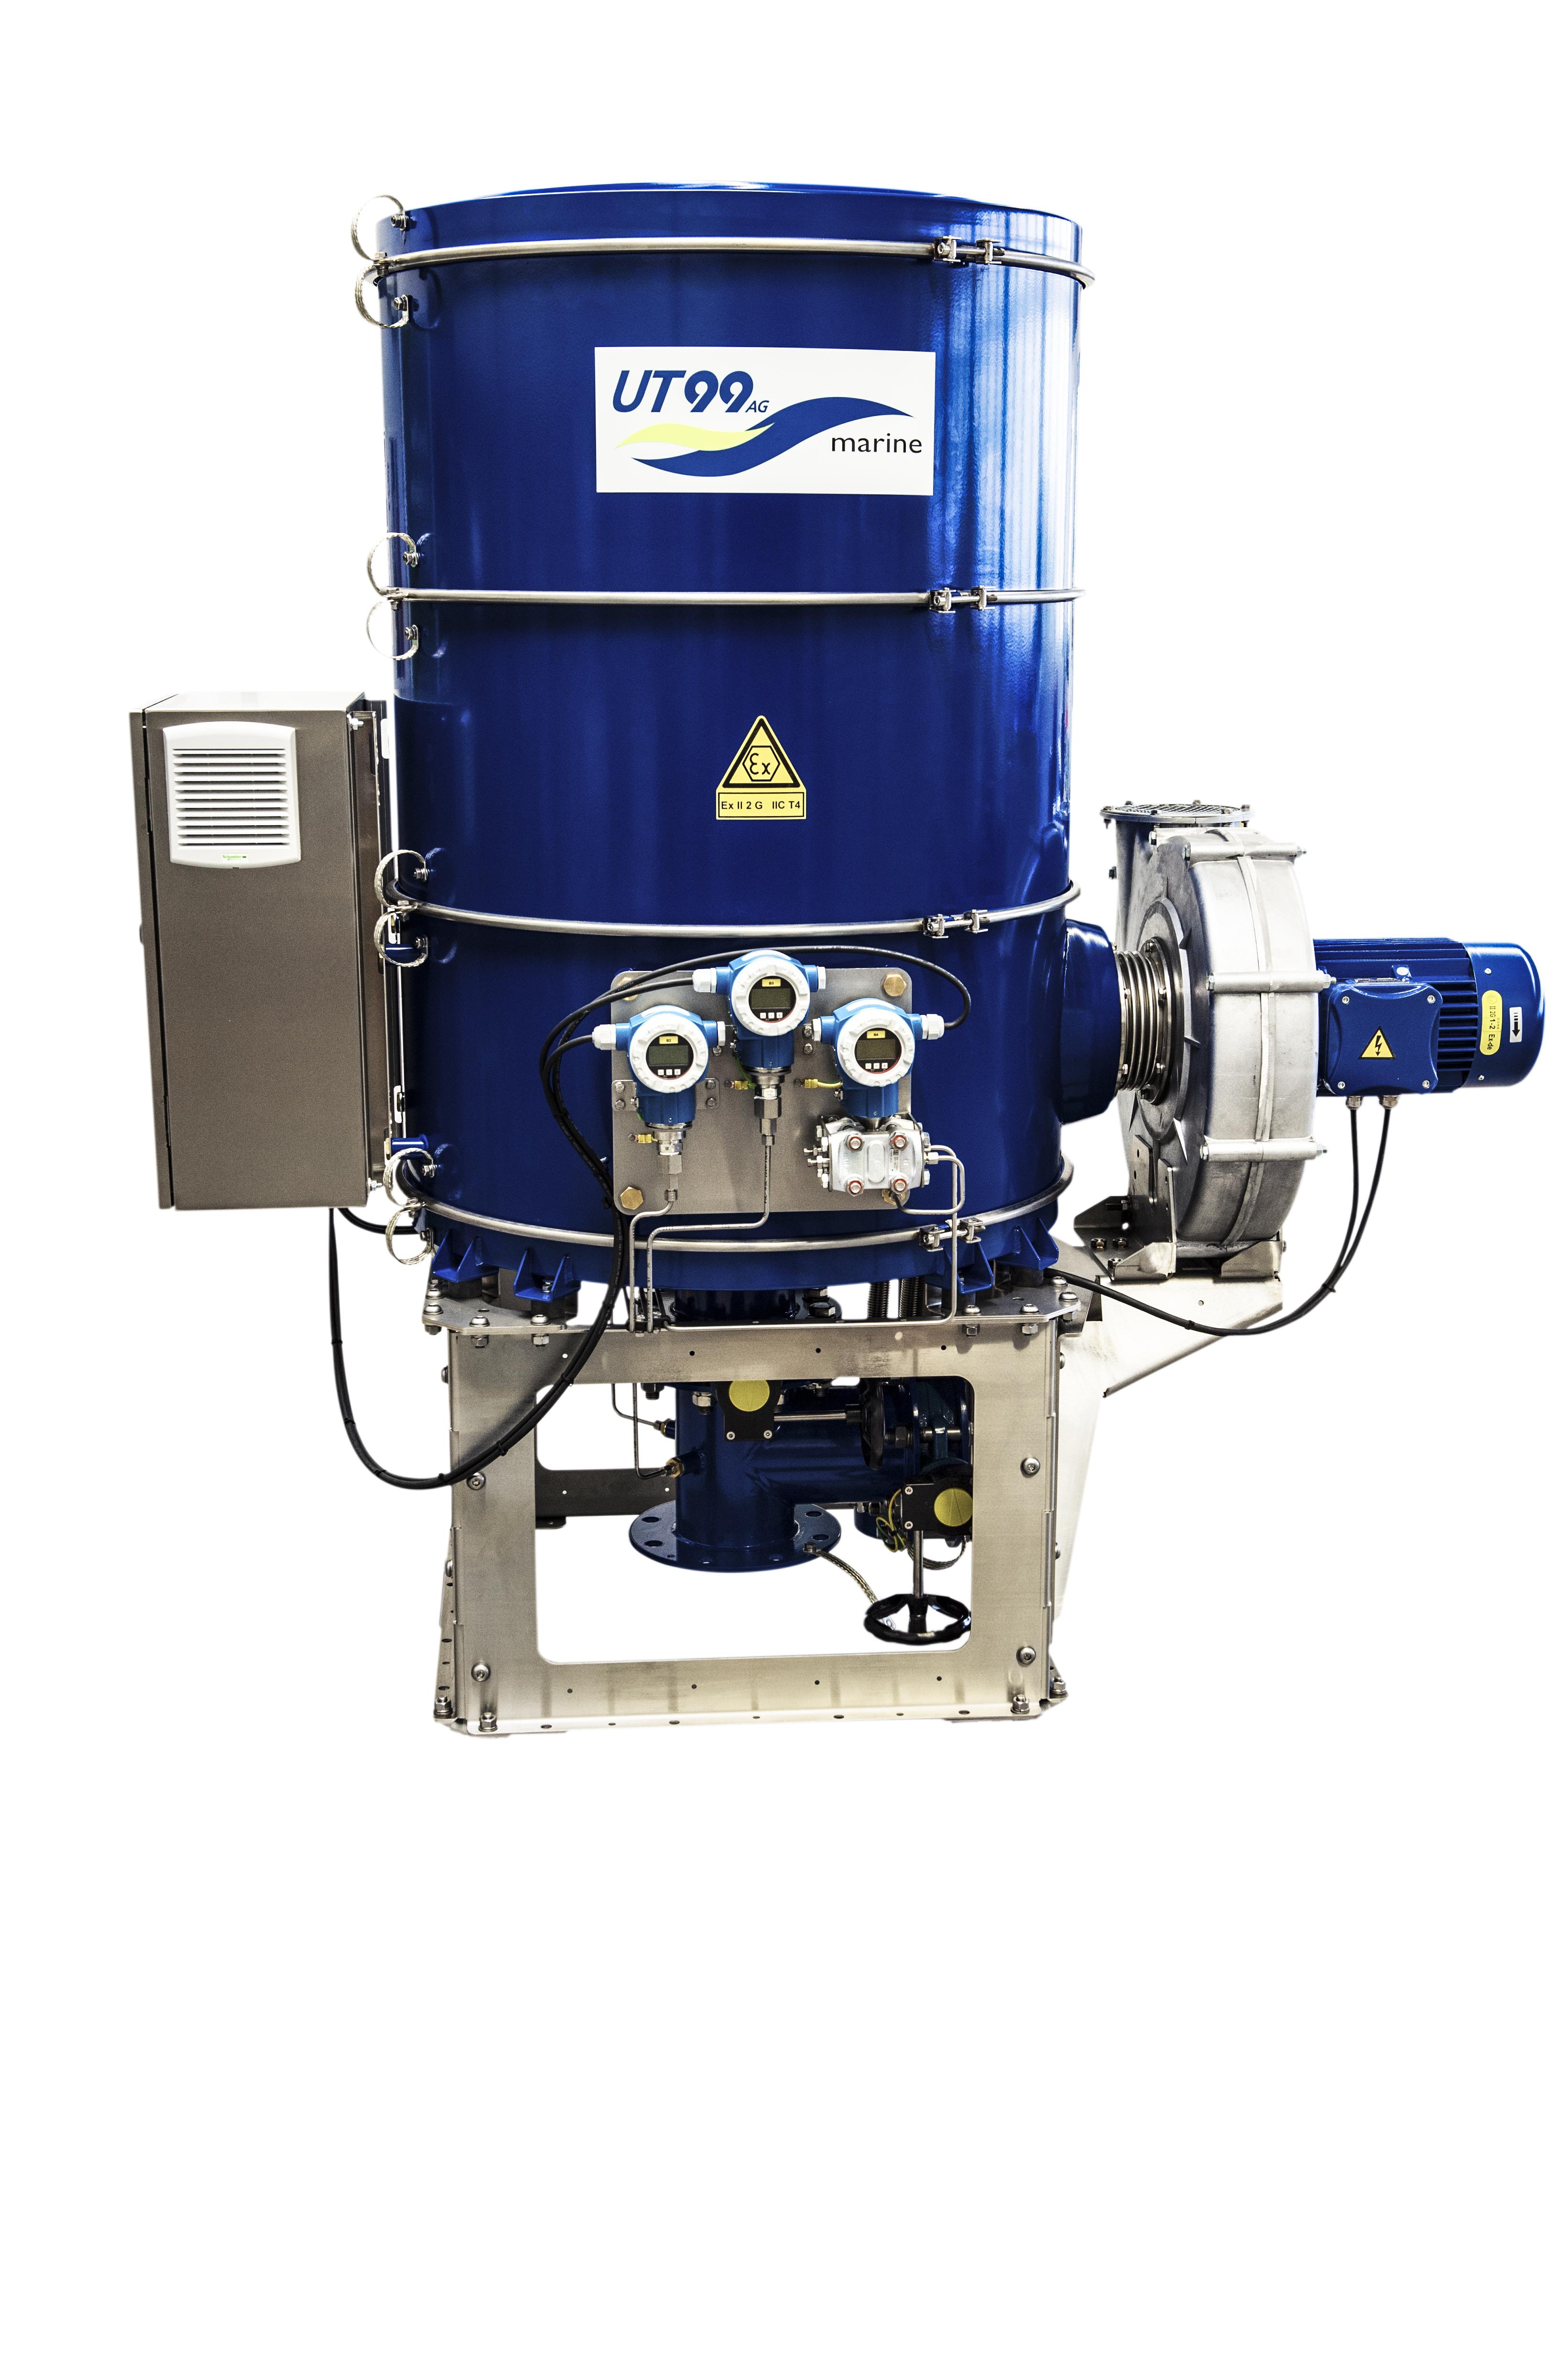 File:UT99 Oil mist separator eliminator blow by filter